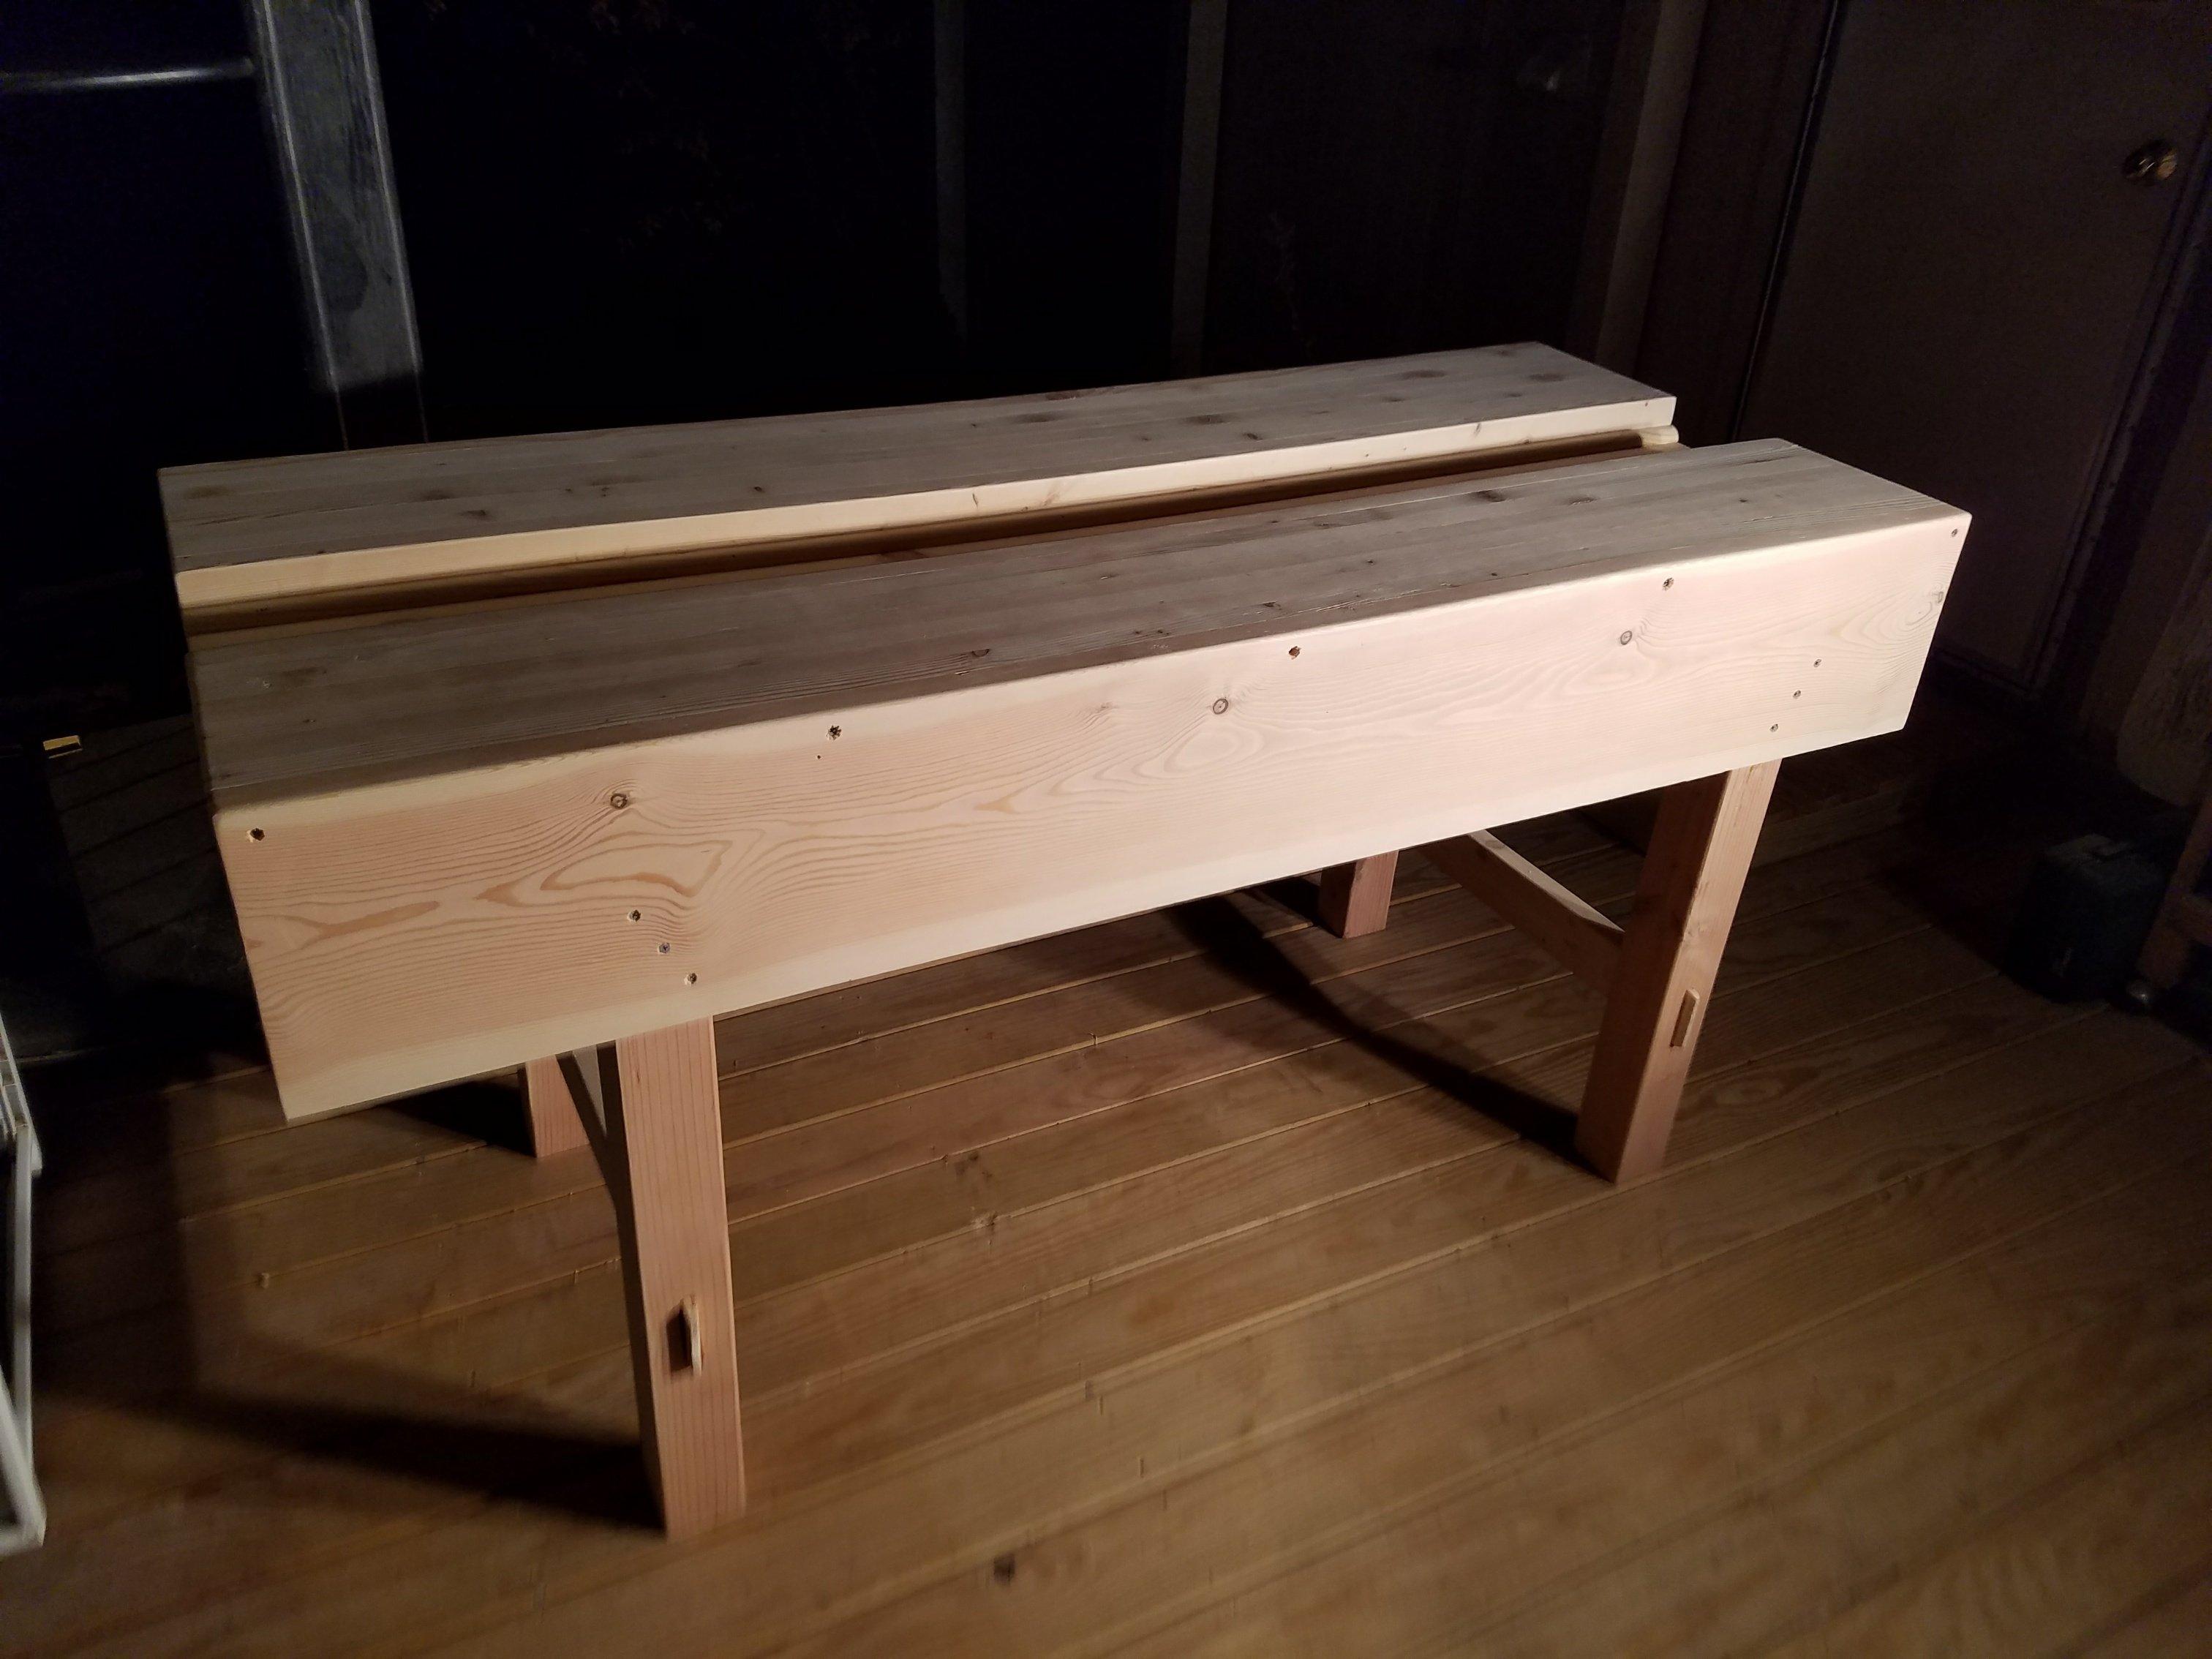 Workbench by kenhamilton